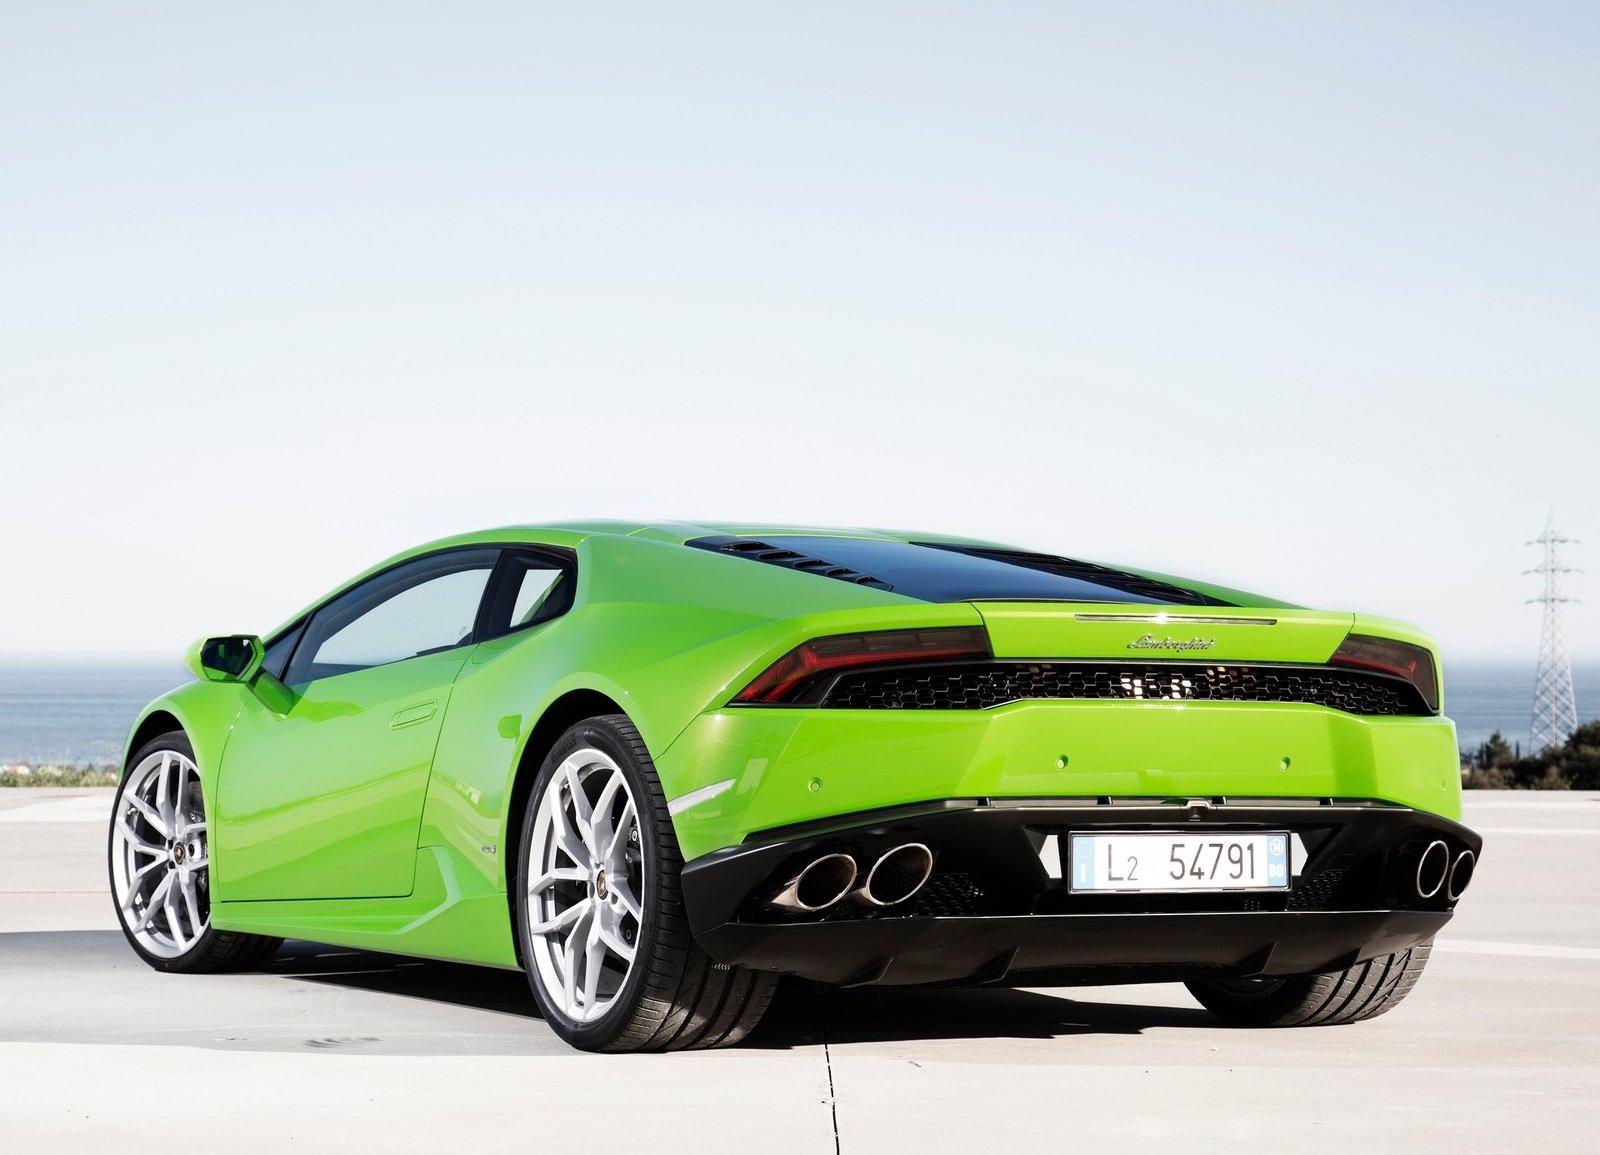 2015 Lamborghini LP610-4